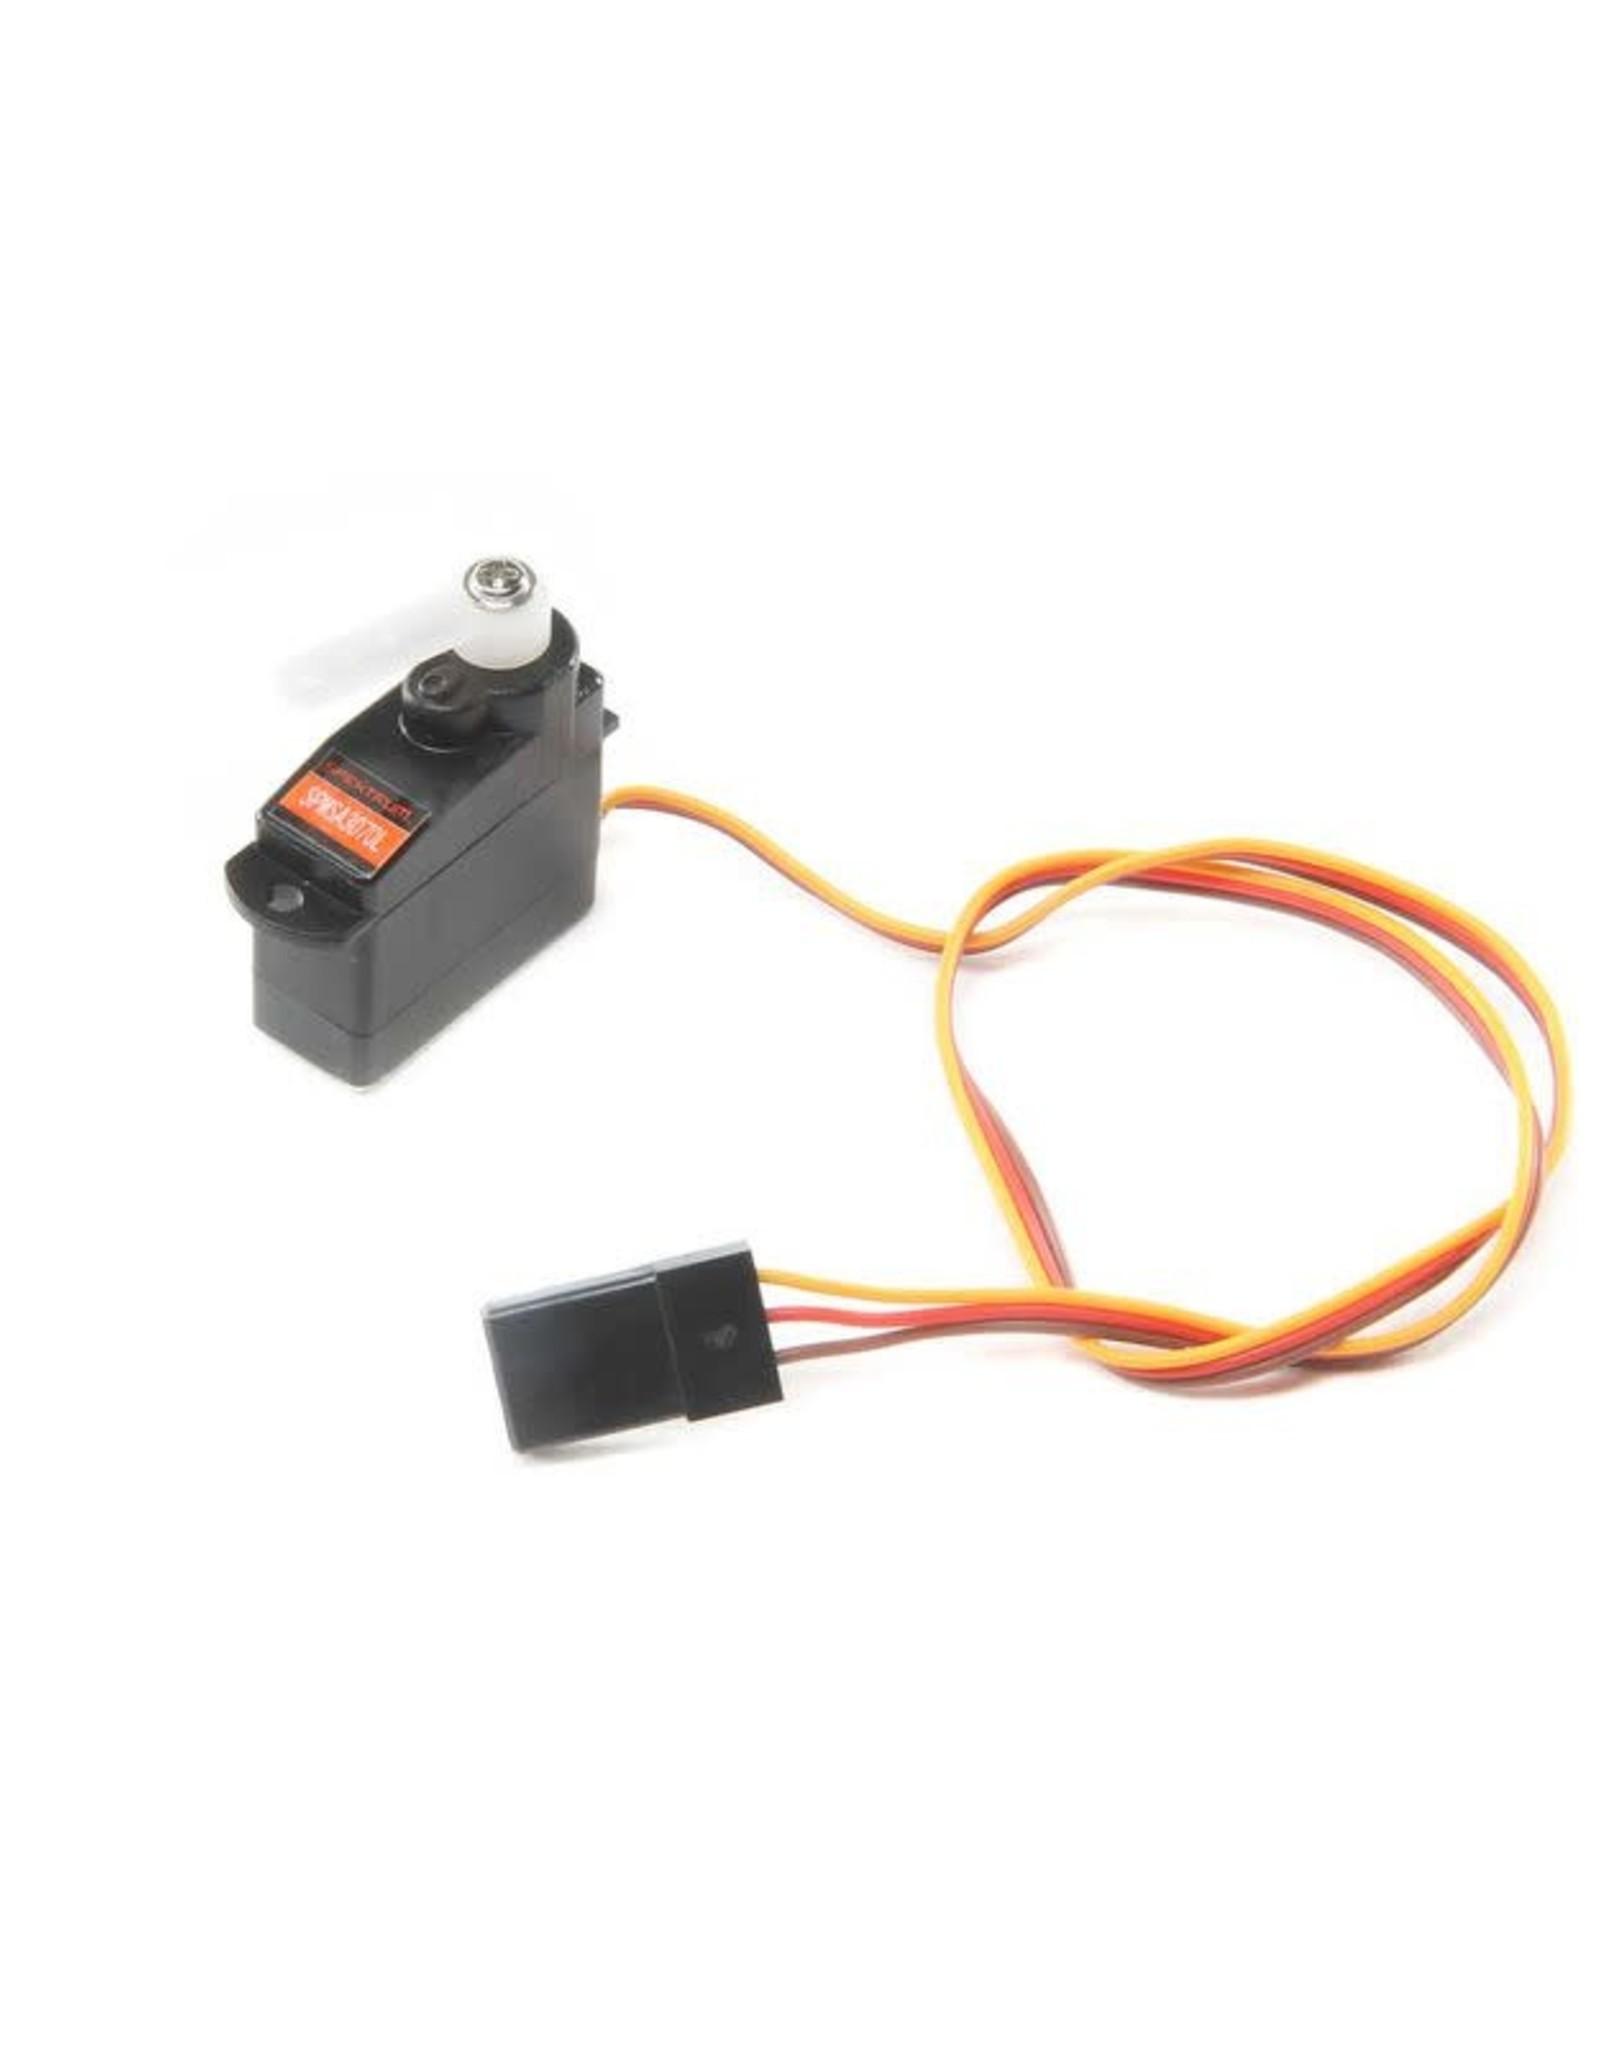 spektrum SPMSA3070L 3.7g Sub-Micro Analog Air Servo Long Lead